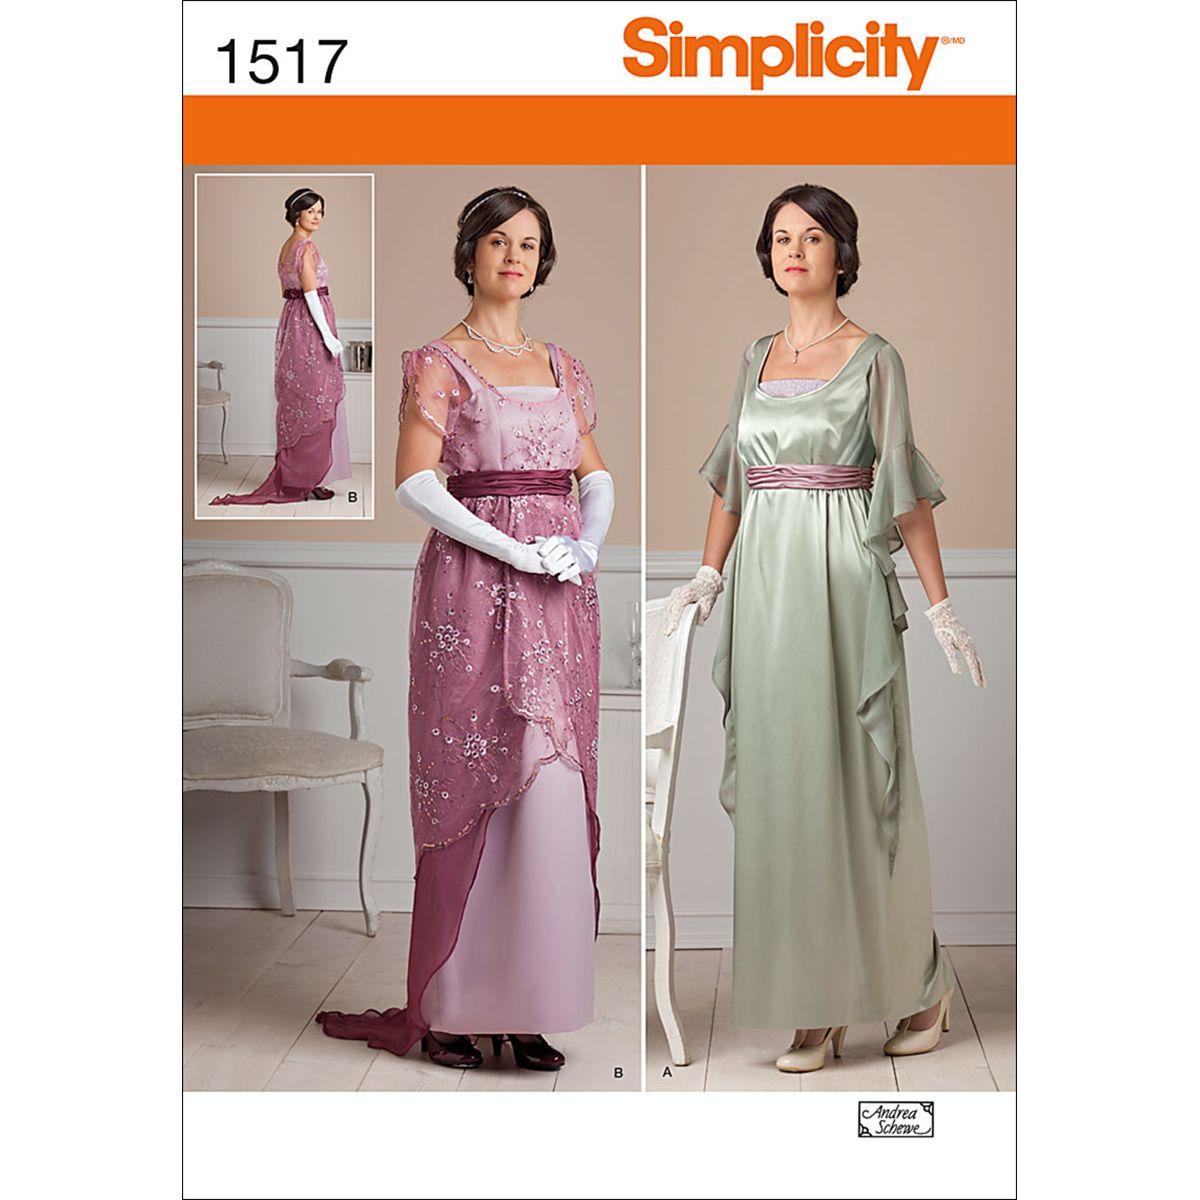 Titanic Fashion - 1st Class Women\'s Clothing | Nähen